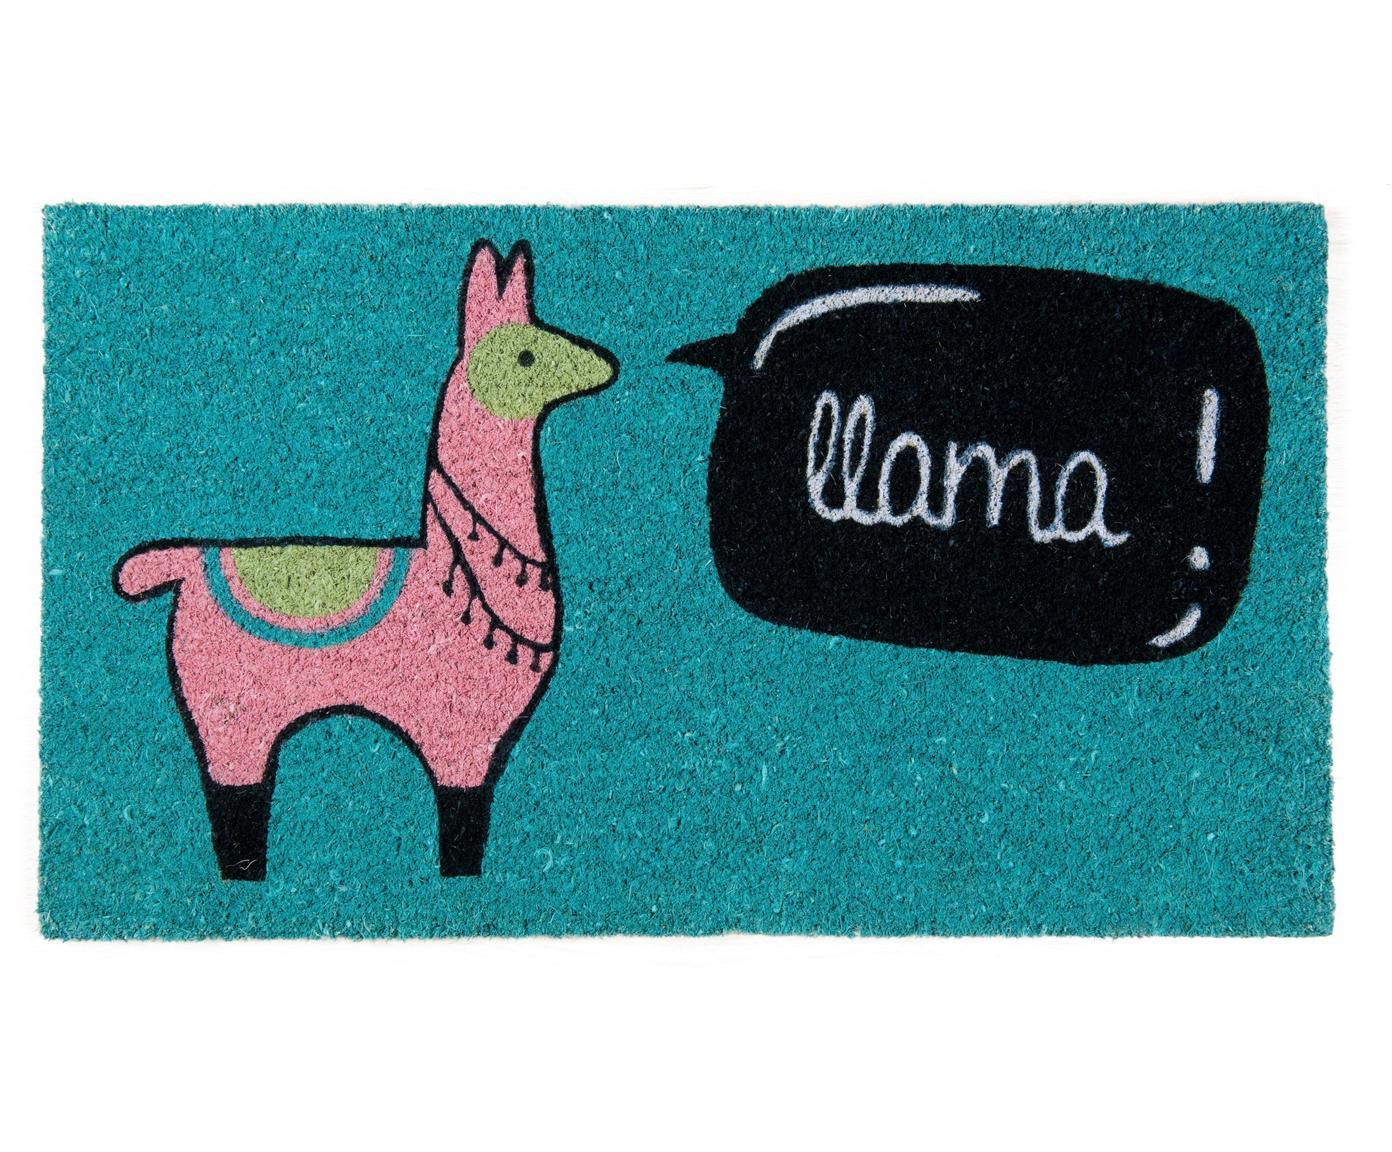 Deurmat Llama, Kokosvezels, Blauw, roze, zwart, beige, wit, 40 x 70 cm